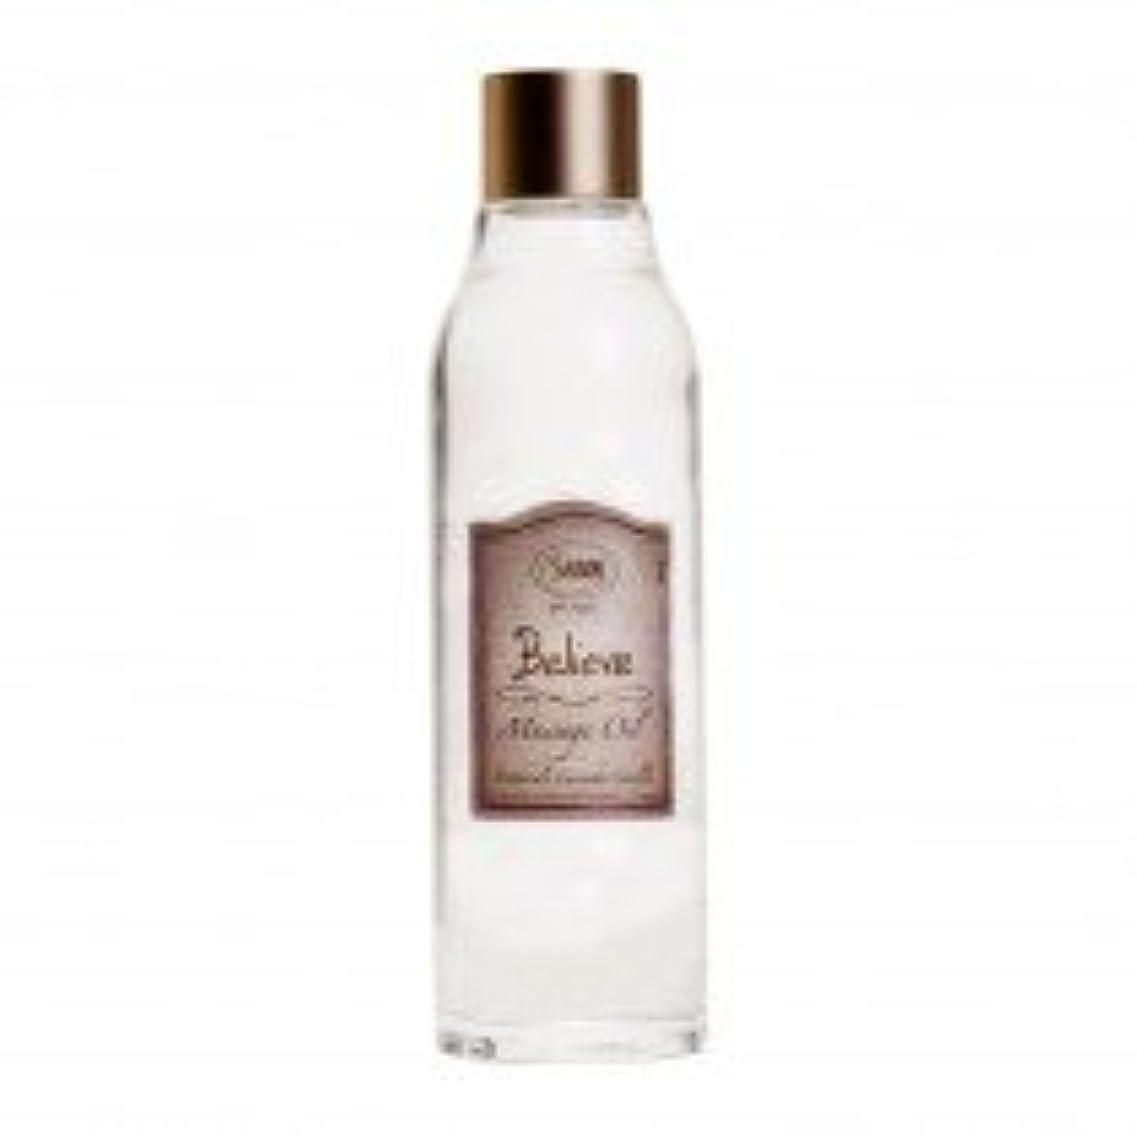 【SABON(サボン)】Massage Oil Believe (PATCHOULI LAVENDER VANILLA) 50ml マッサージ オイル ビリーヴ パチョリラベンダーバニラ [並行輸入品]